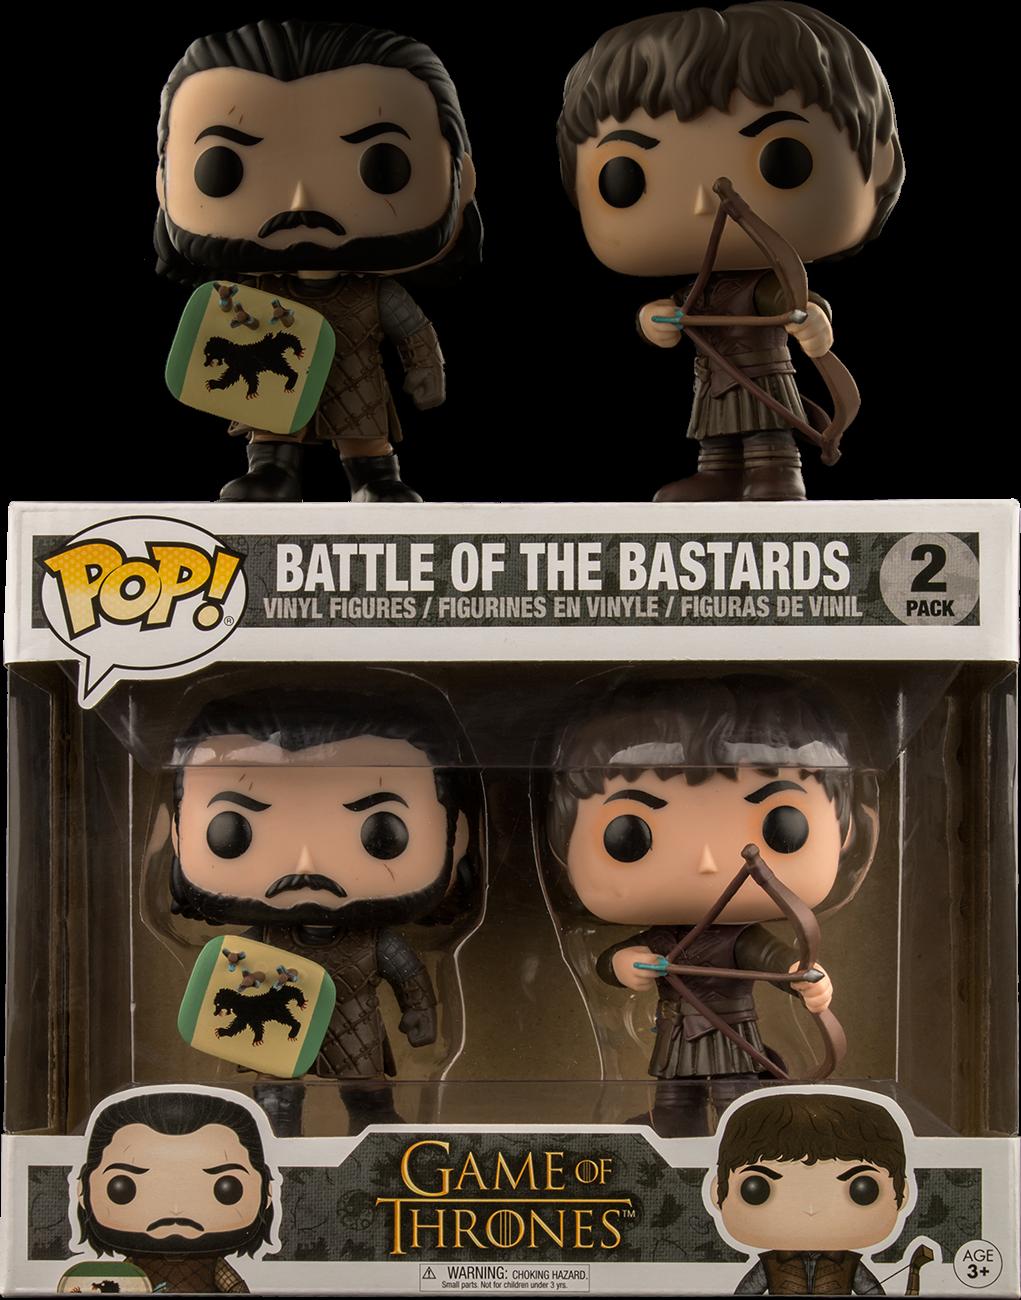 Game of Thrones - Battle of the Bastards Pop! Vinyl Figure 2-Pack